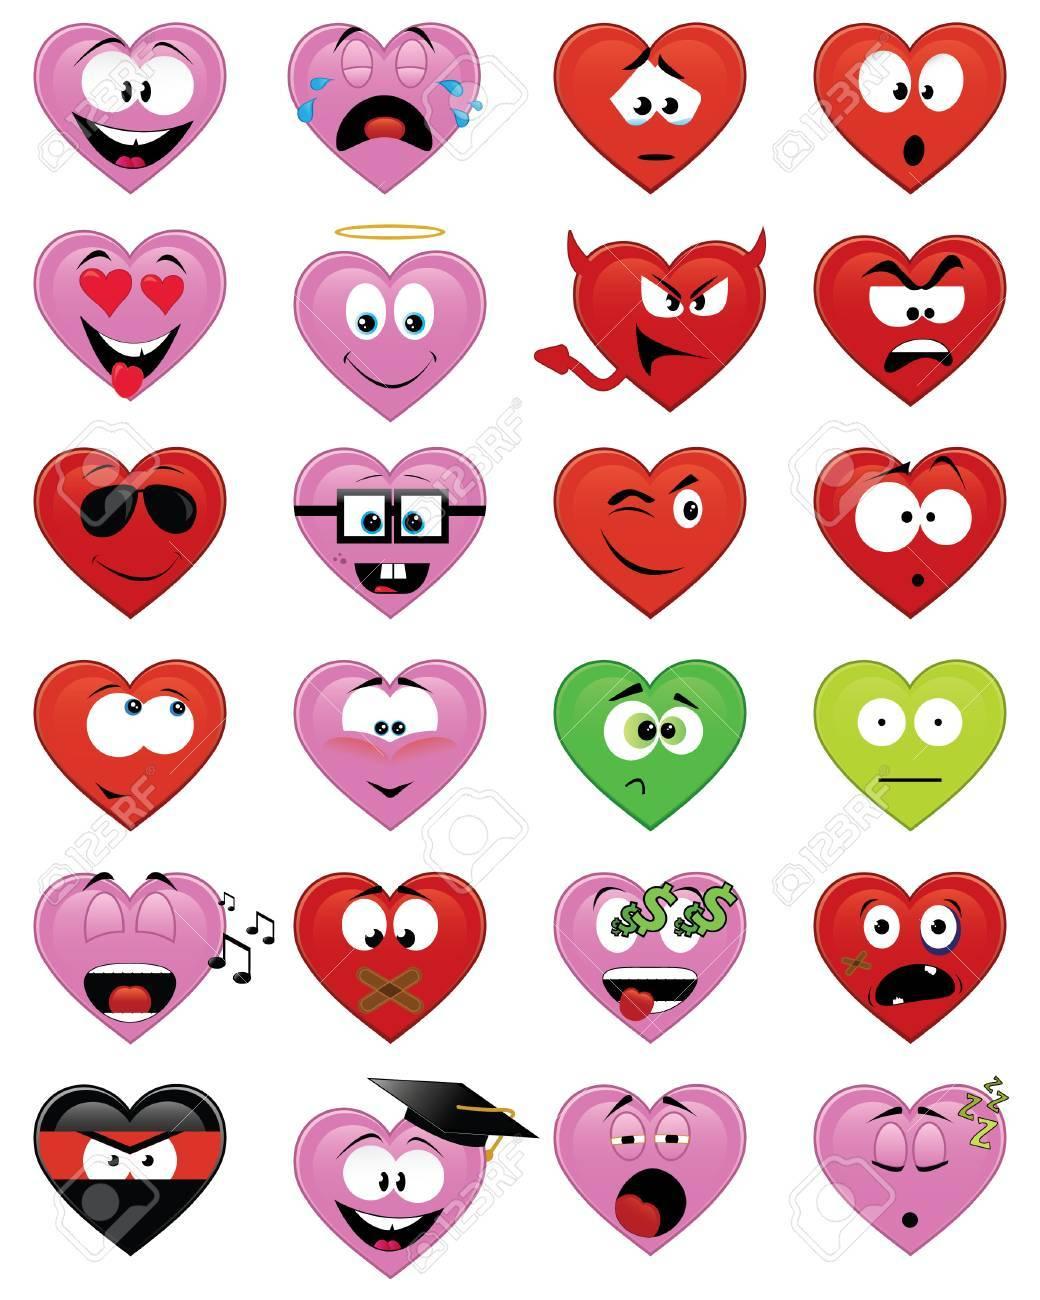 Heart-shaped smiles Stock Vector - 6344231